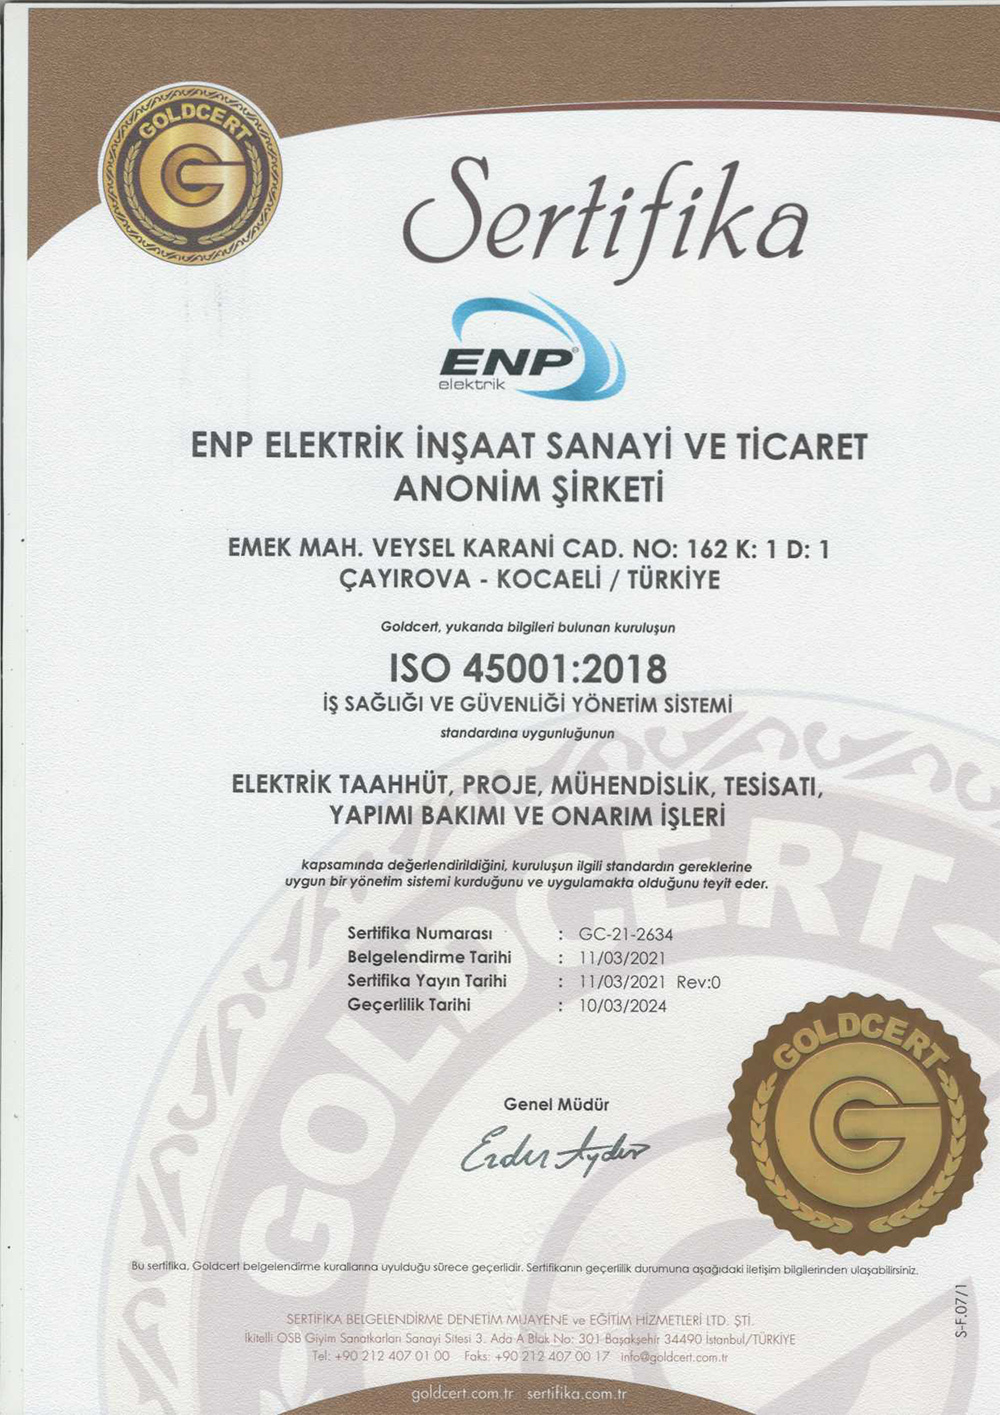 ENP ELEKTRIK ISO 45001 SERTIFIKA